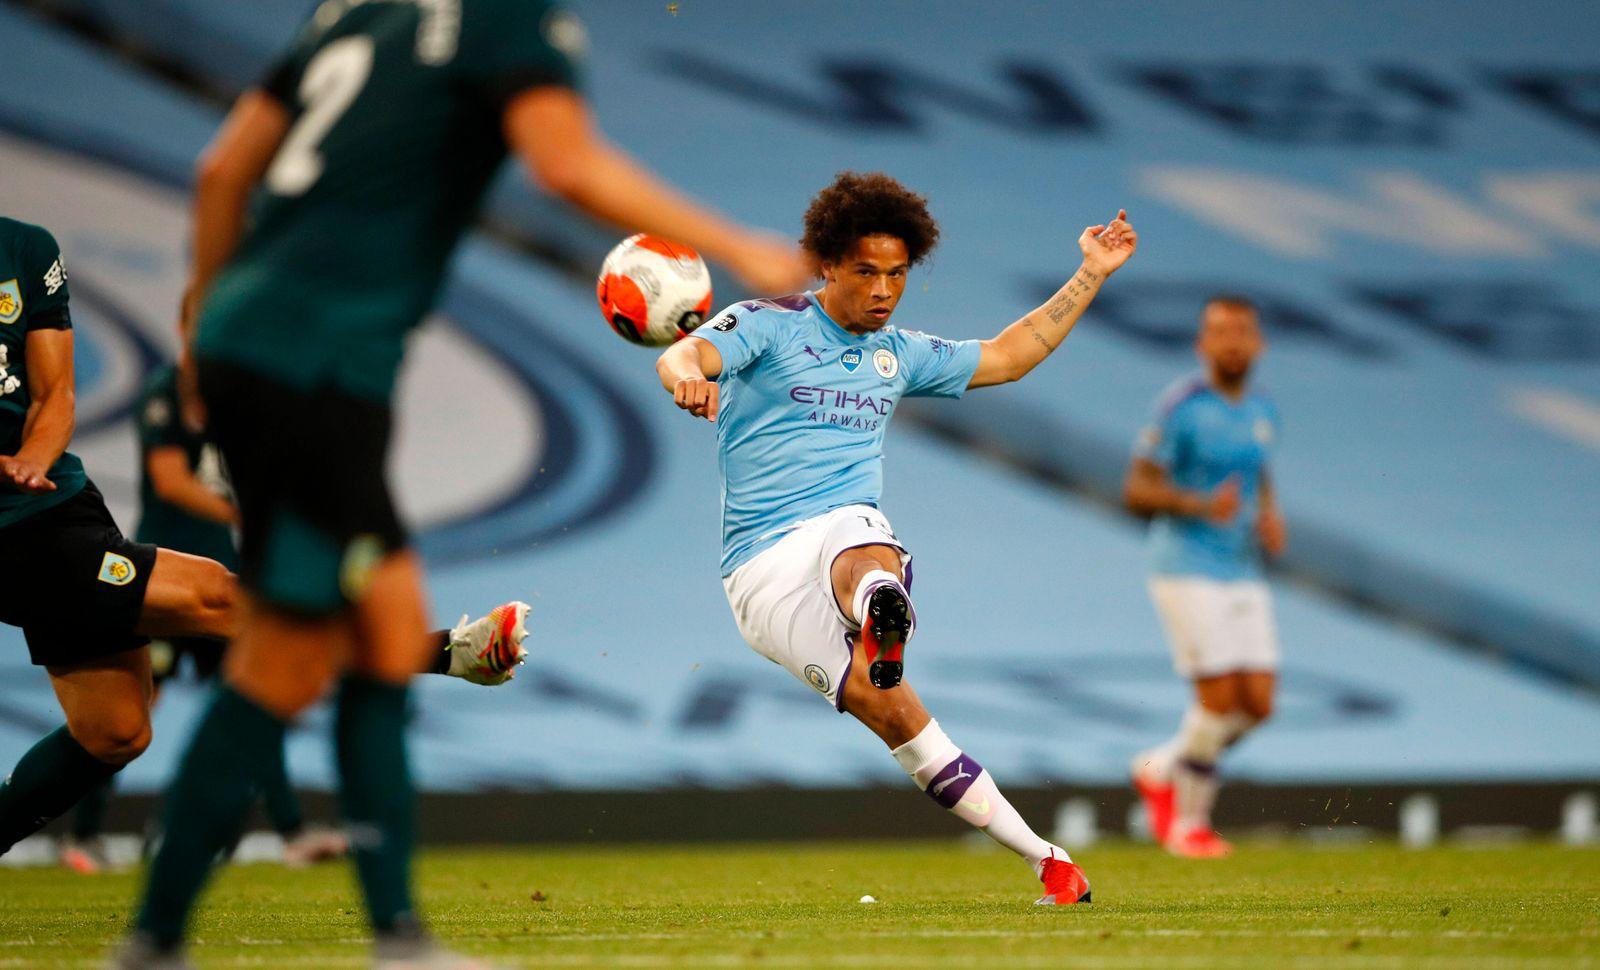 Football - 2019 / 2020 Premier League - Manchester City vs. Burnley Leroy Sane of Manchester City at the Etihad Stadium.